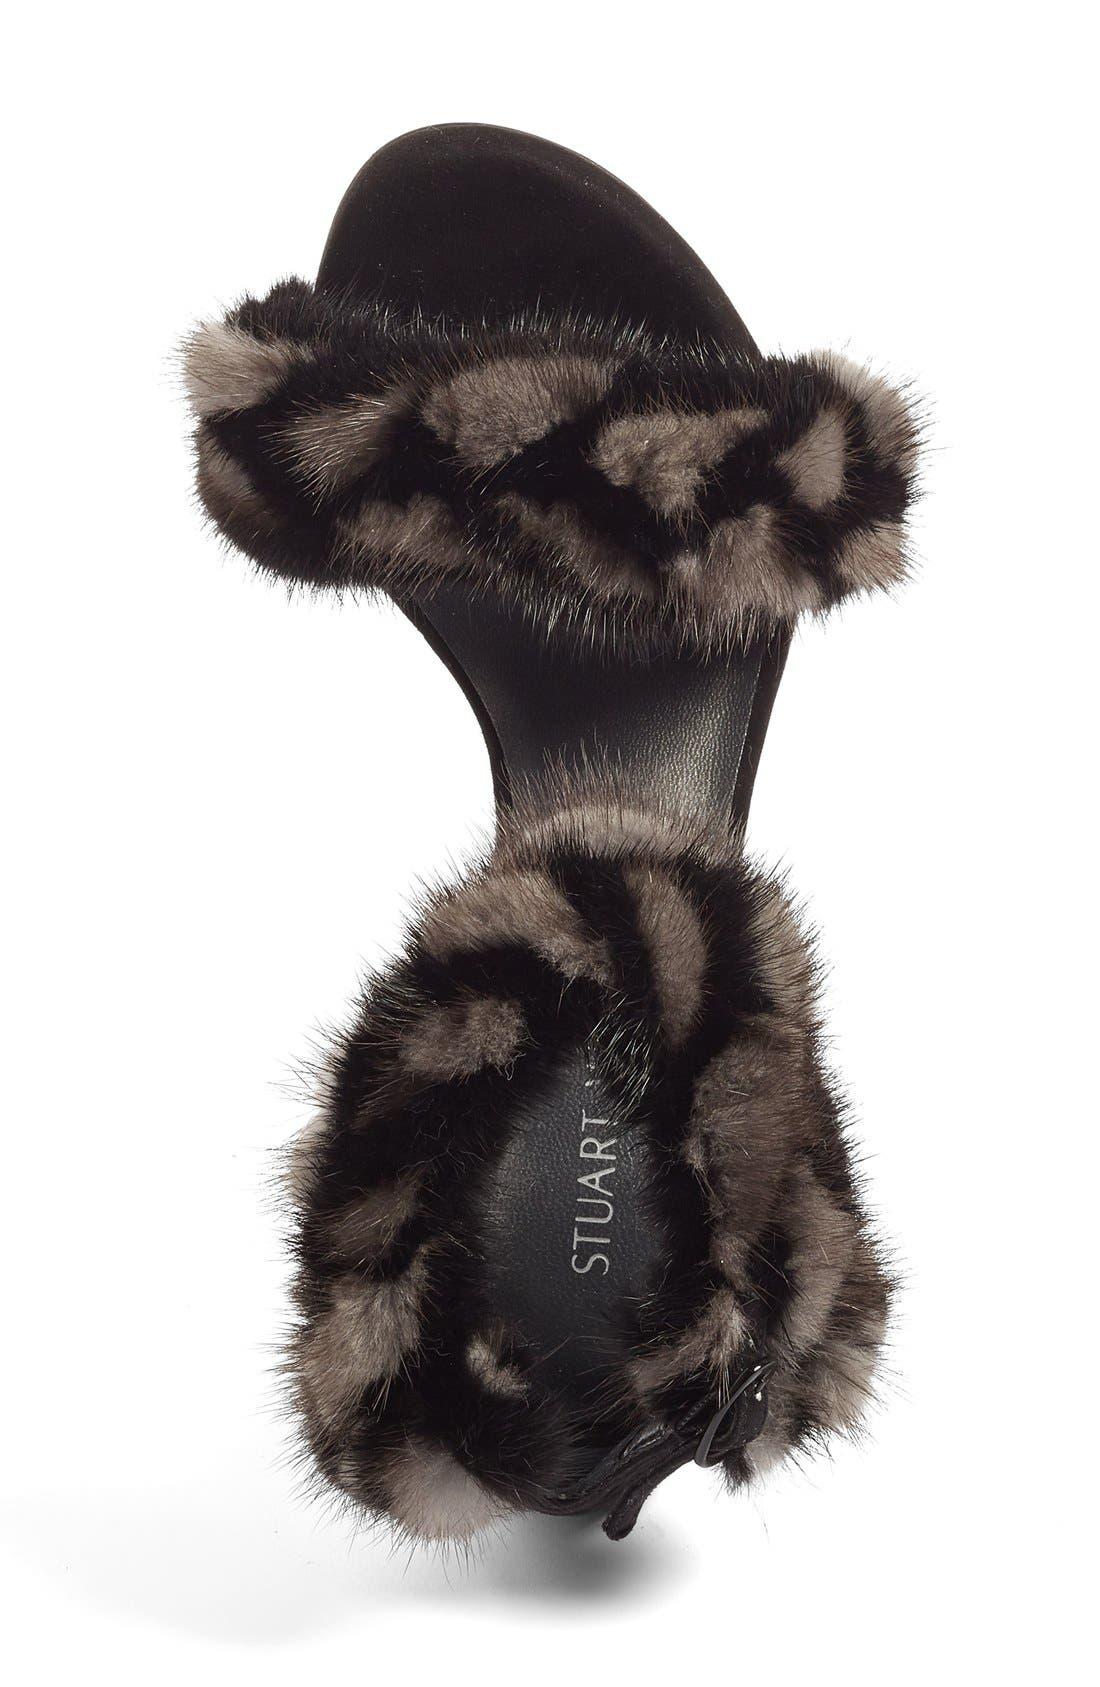 STUART WEITZMAN, 'Bunnylove' Genuine Mink Fur Ankle Strap Sandal, Alternate thumbnail 4, color, 980